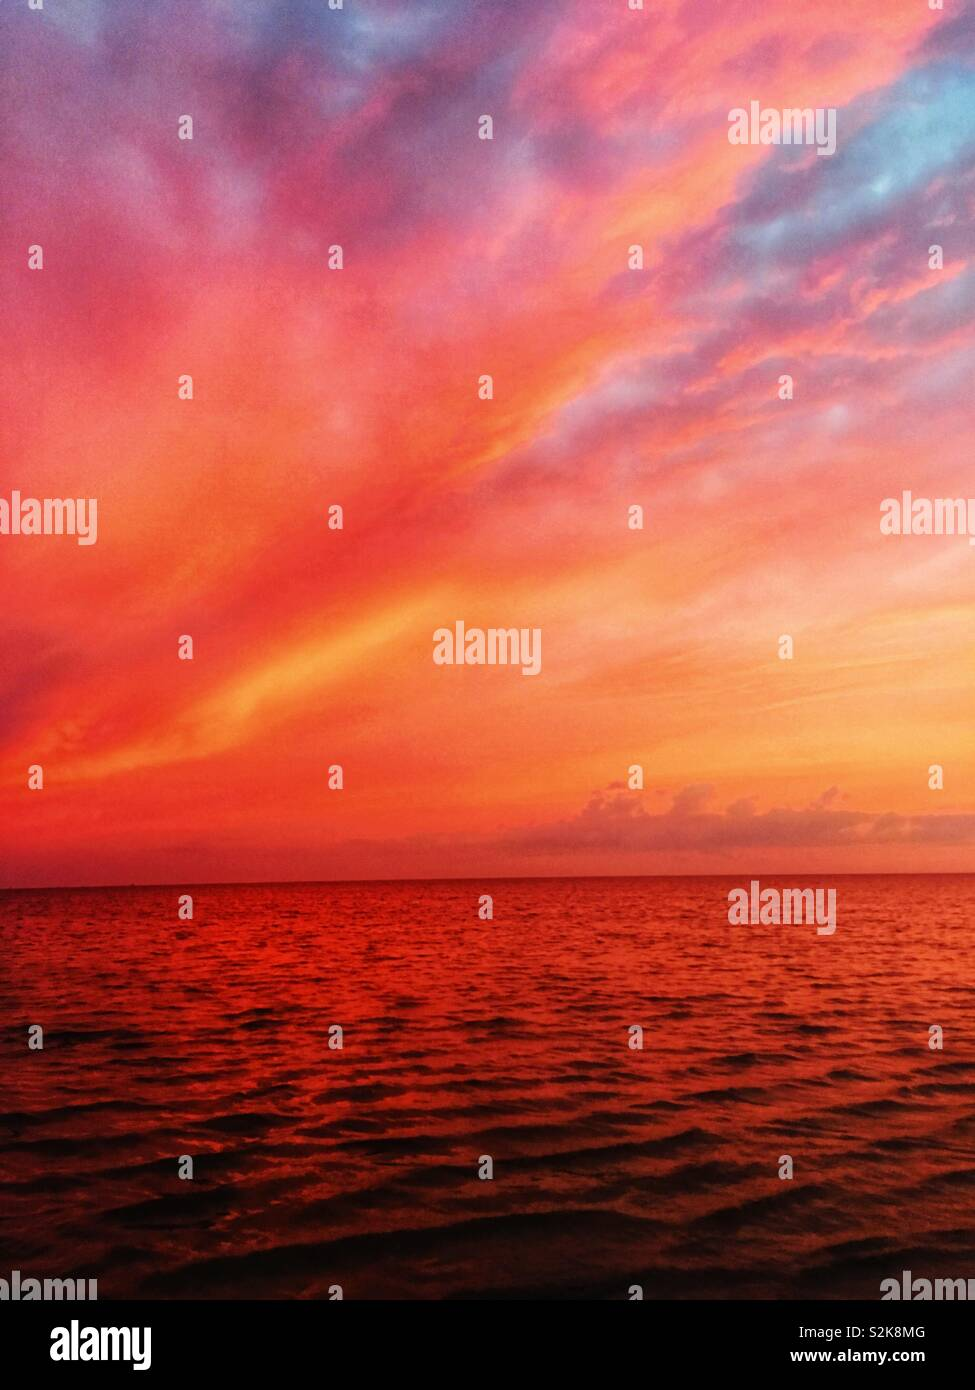 Sonnenuntergang in Avon, NC Stockfoto